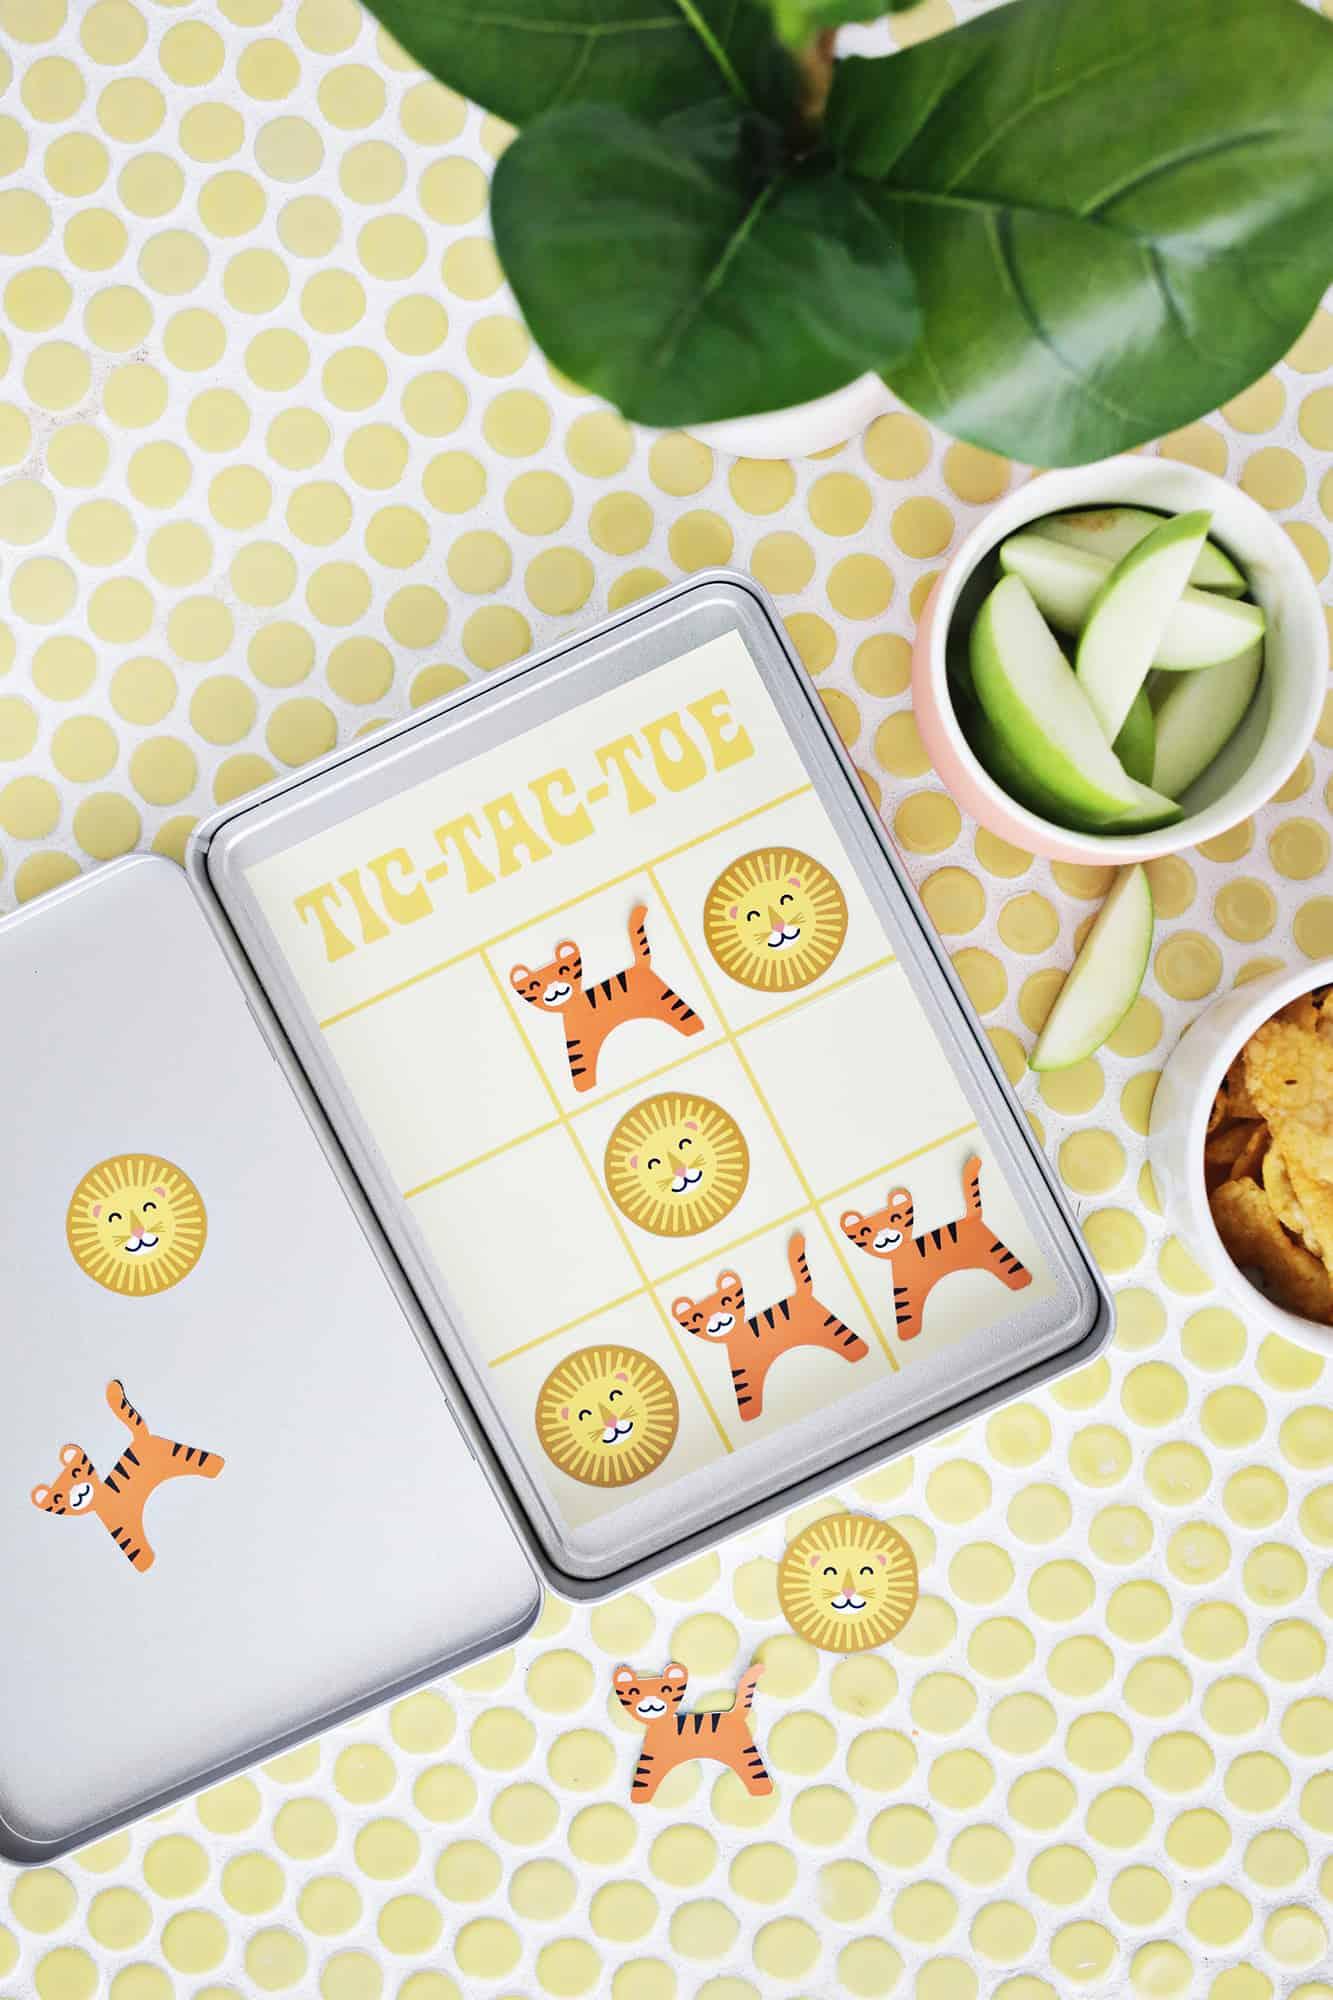 Portable Tic-Tac-Toe Game